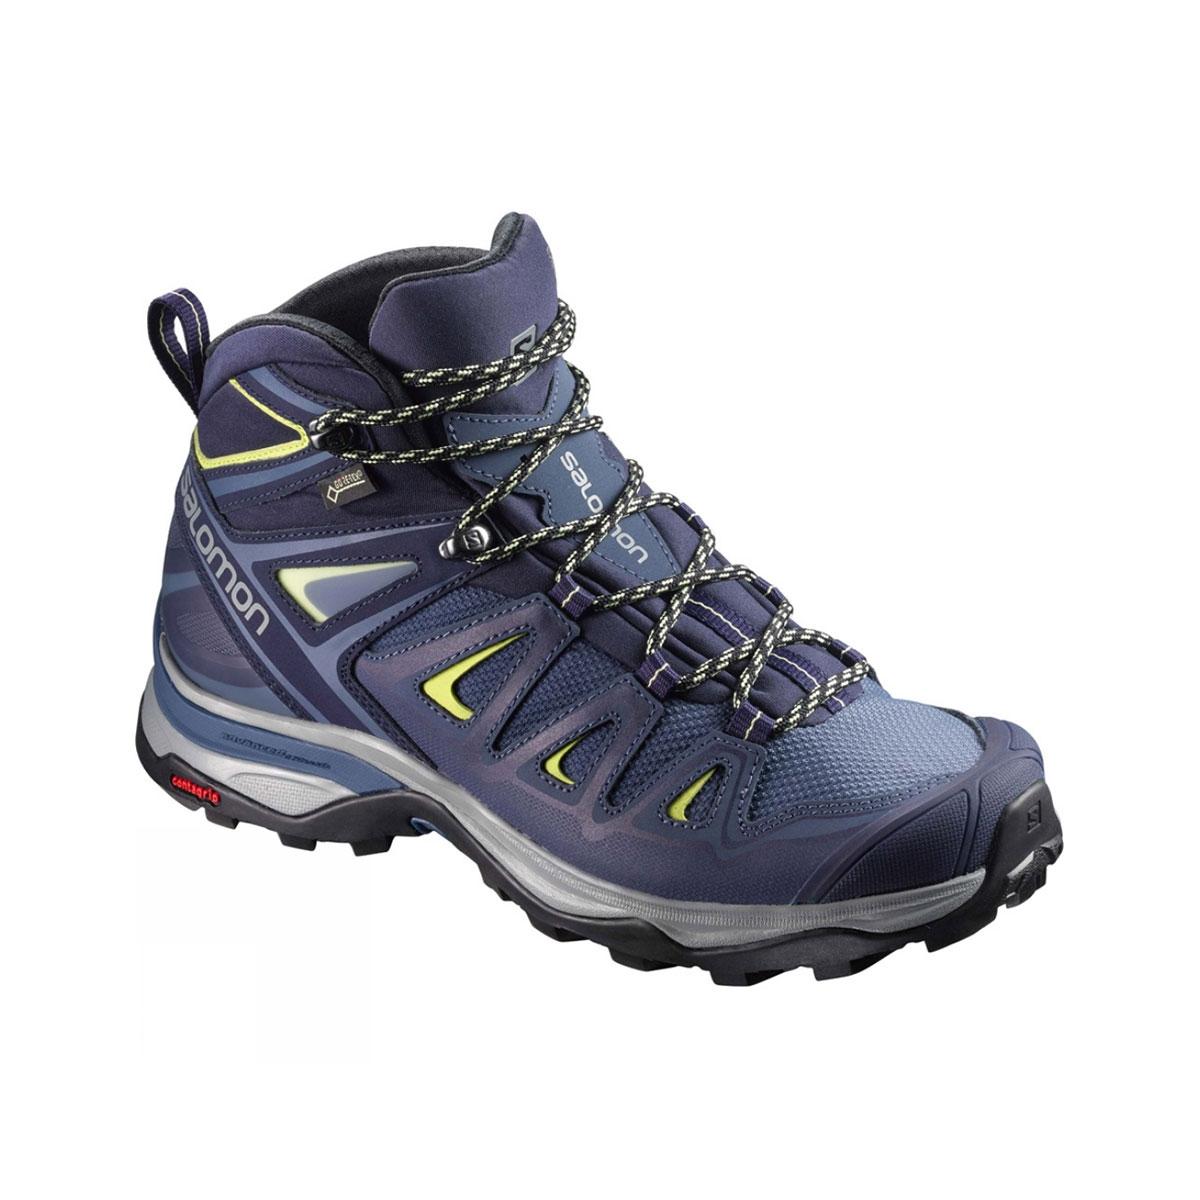 36cece49 Salomon X Ultra Mid 3 GTX Walking Boots (Women's) - Crown Blue/Evening  Blue/Sunny Lime